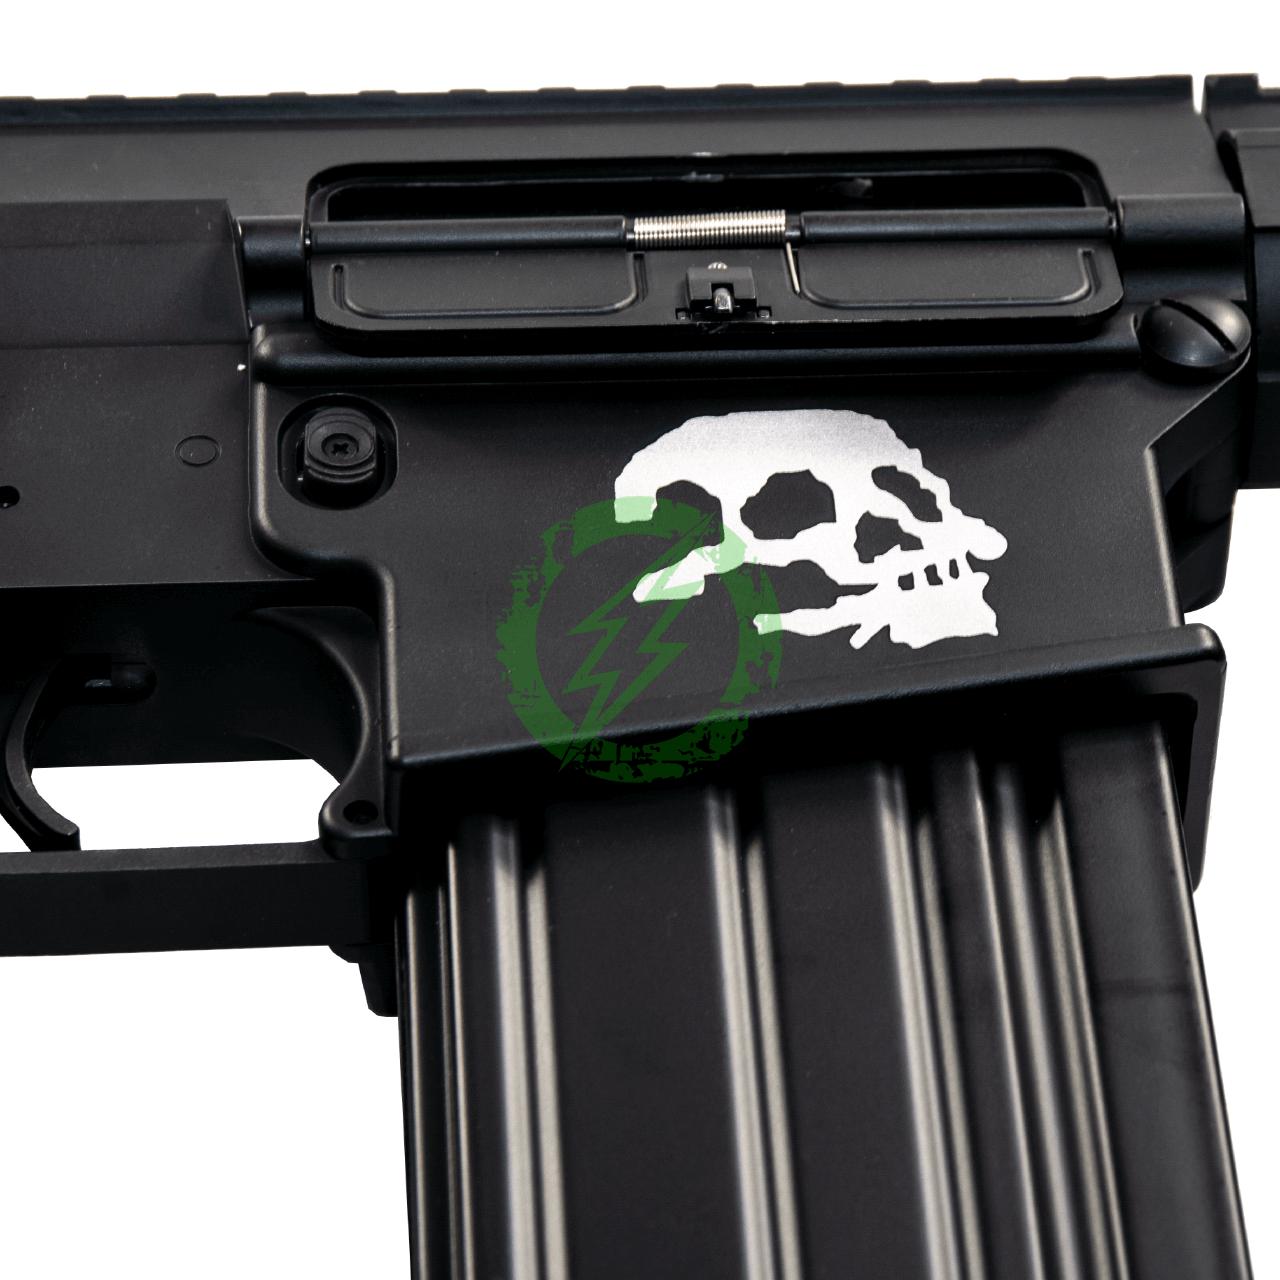 A&K Full Metal SR-25 Airsoft AEG Rifle | Zombie Killer Edition skull